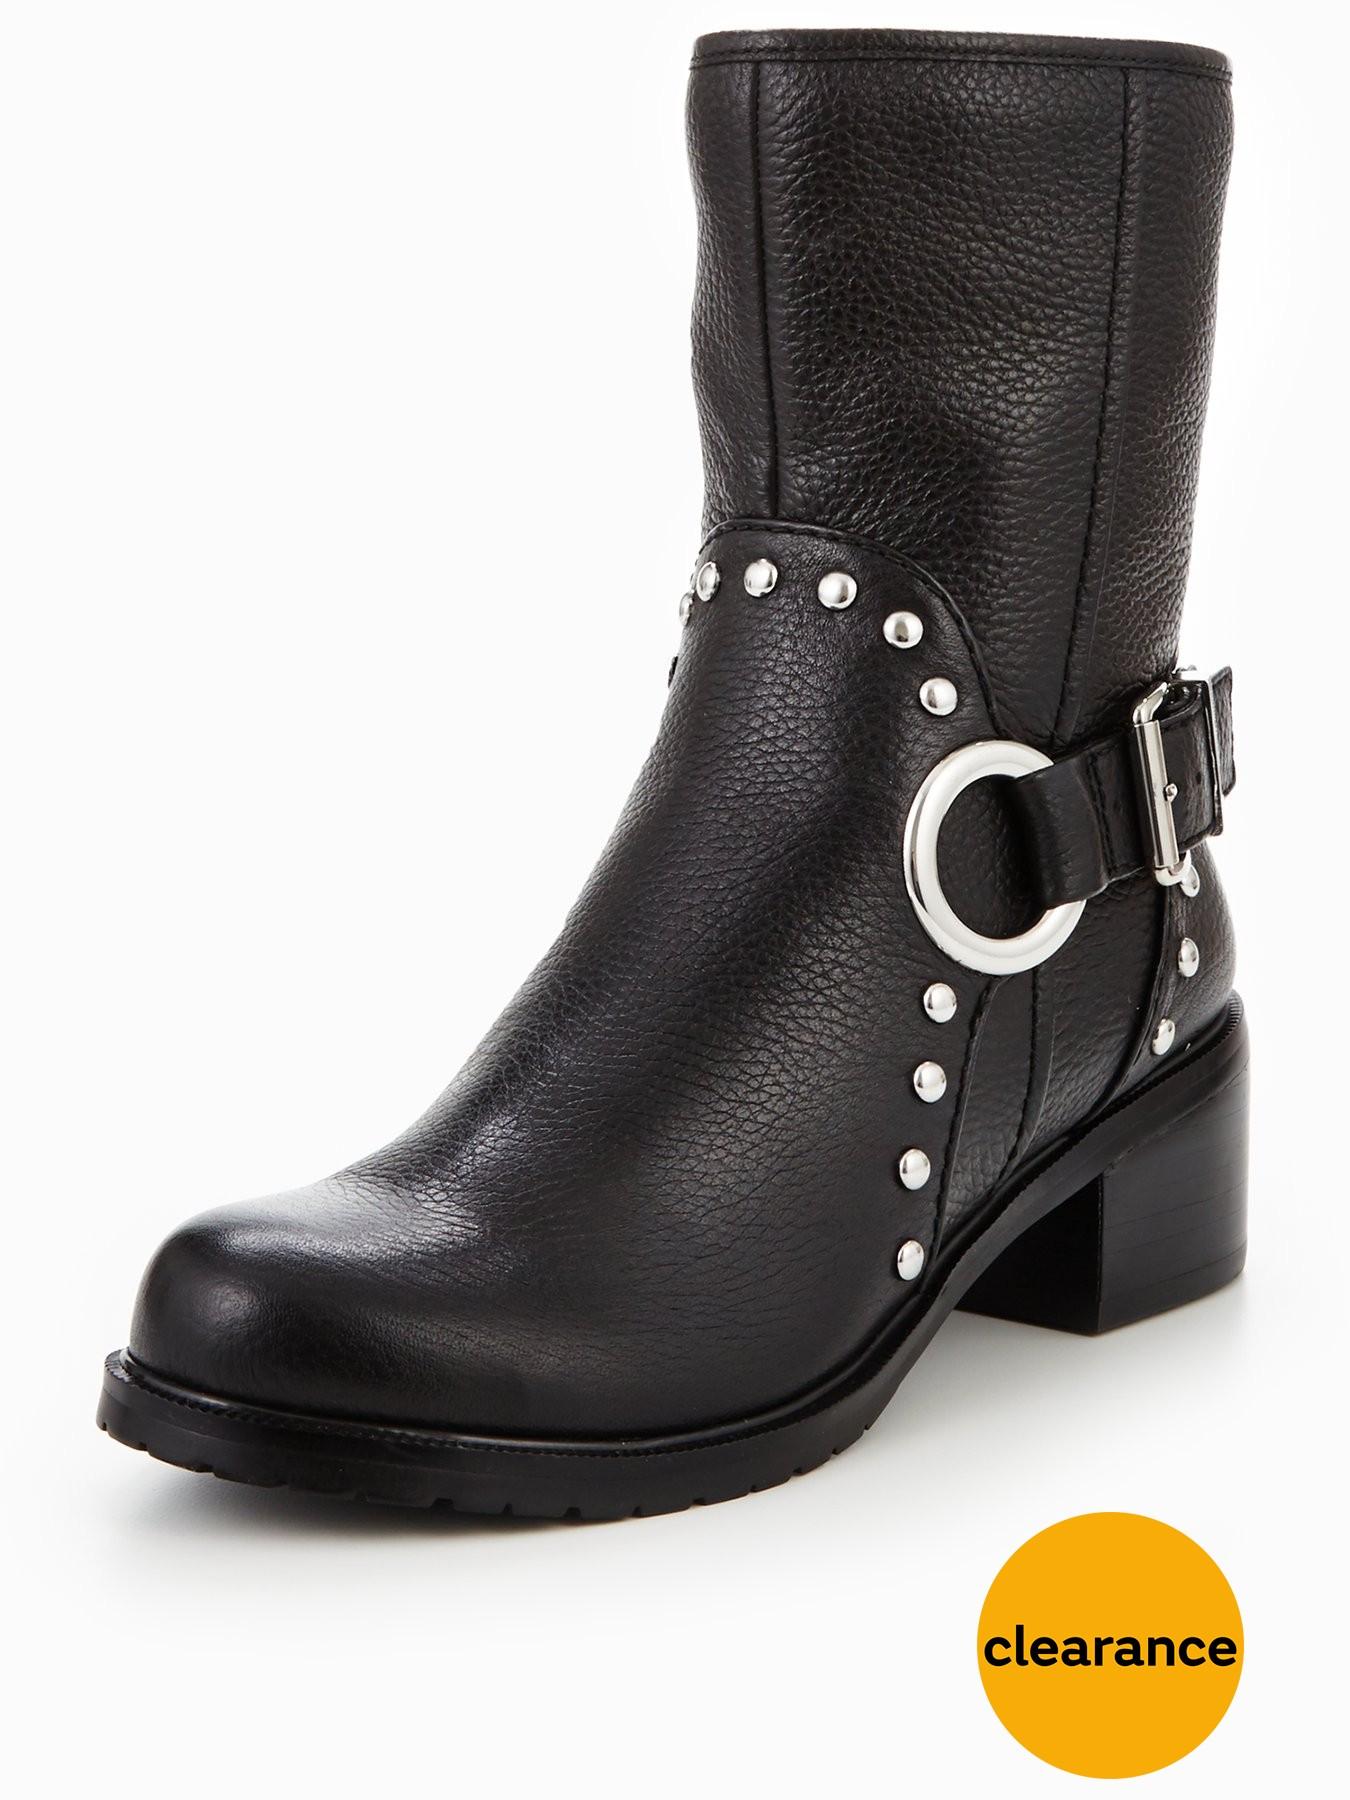 KAREN MILLEN Studded Biker Boot 1600204014 Women's Shoes KAREN MILLEN Boots